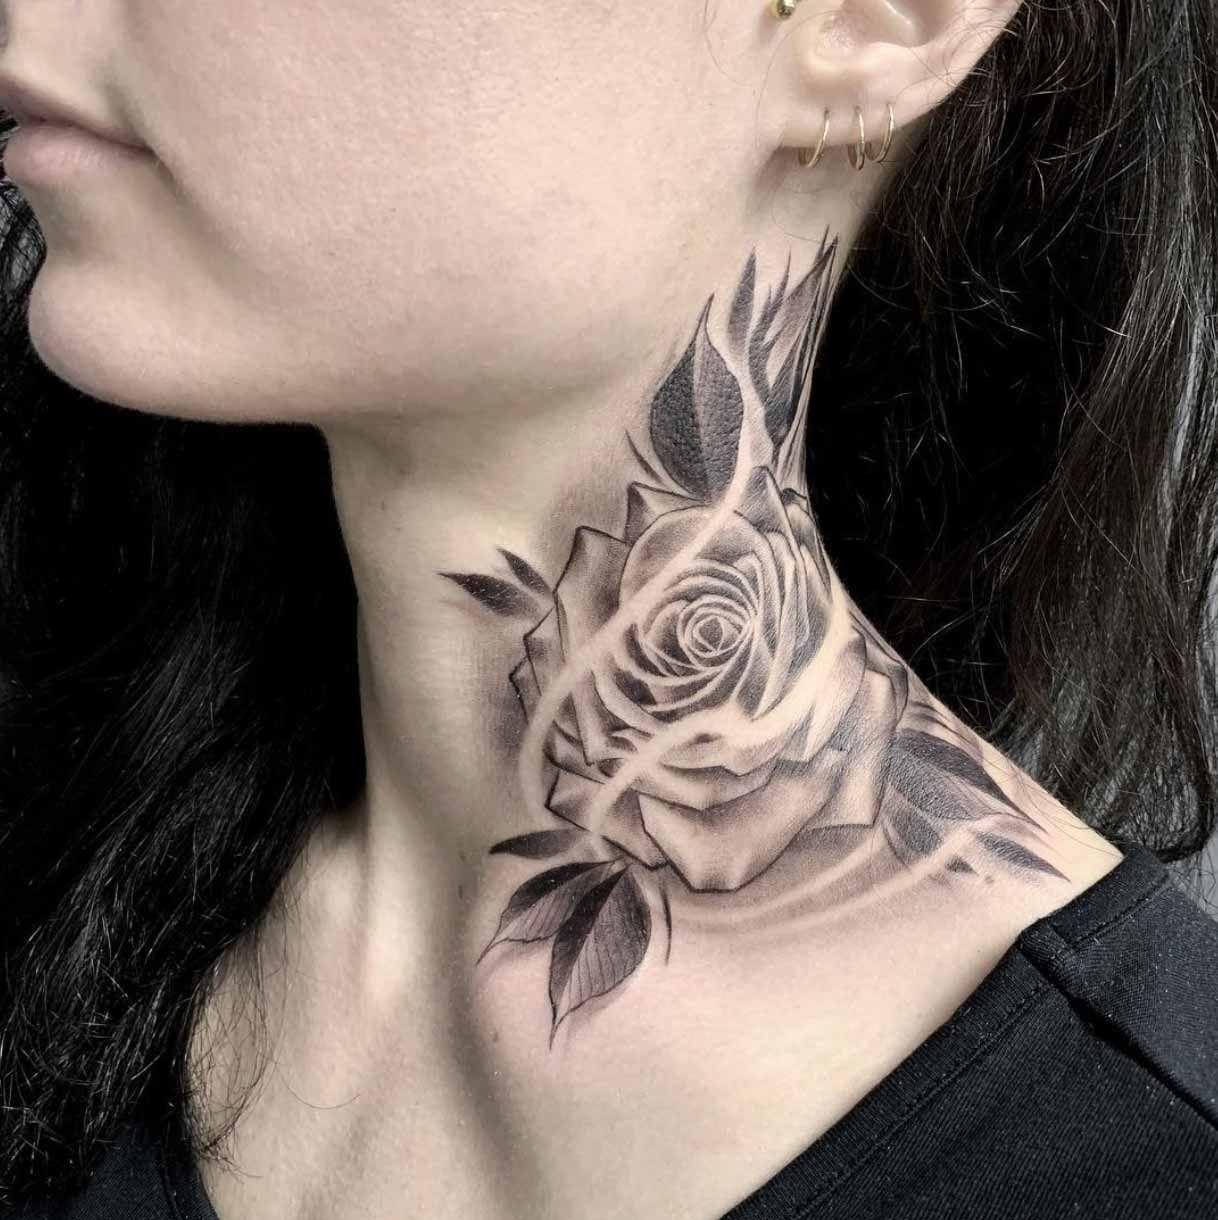 neck tattoos women side,neck tattoos women back of,neck